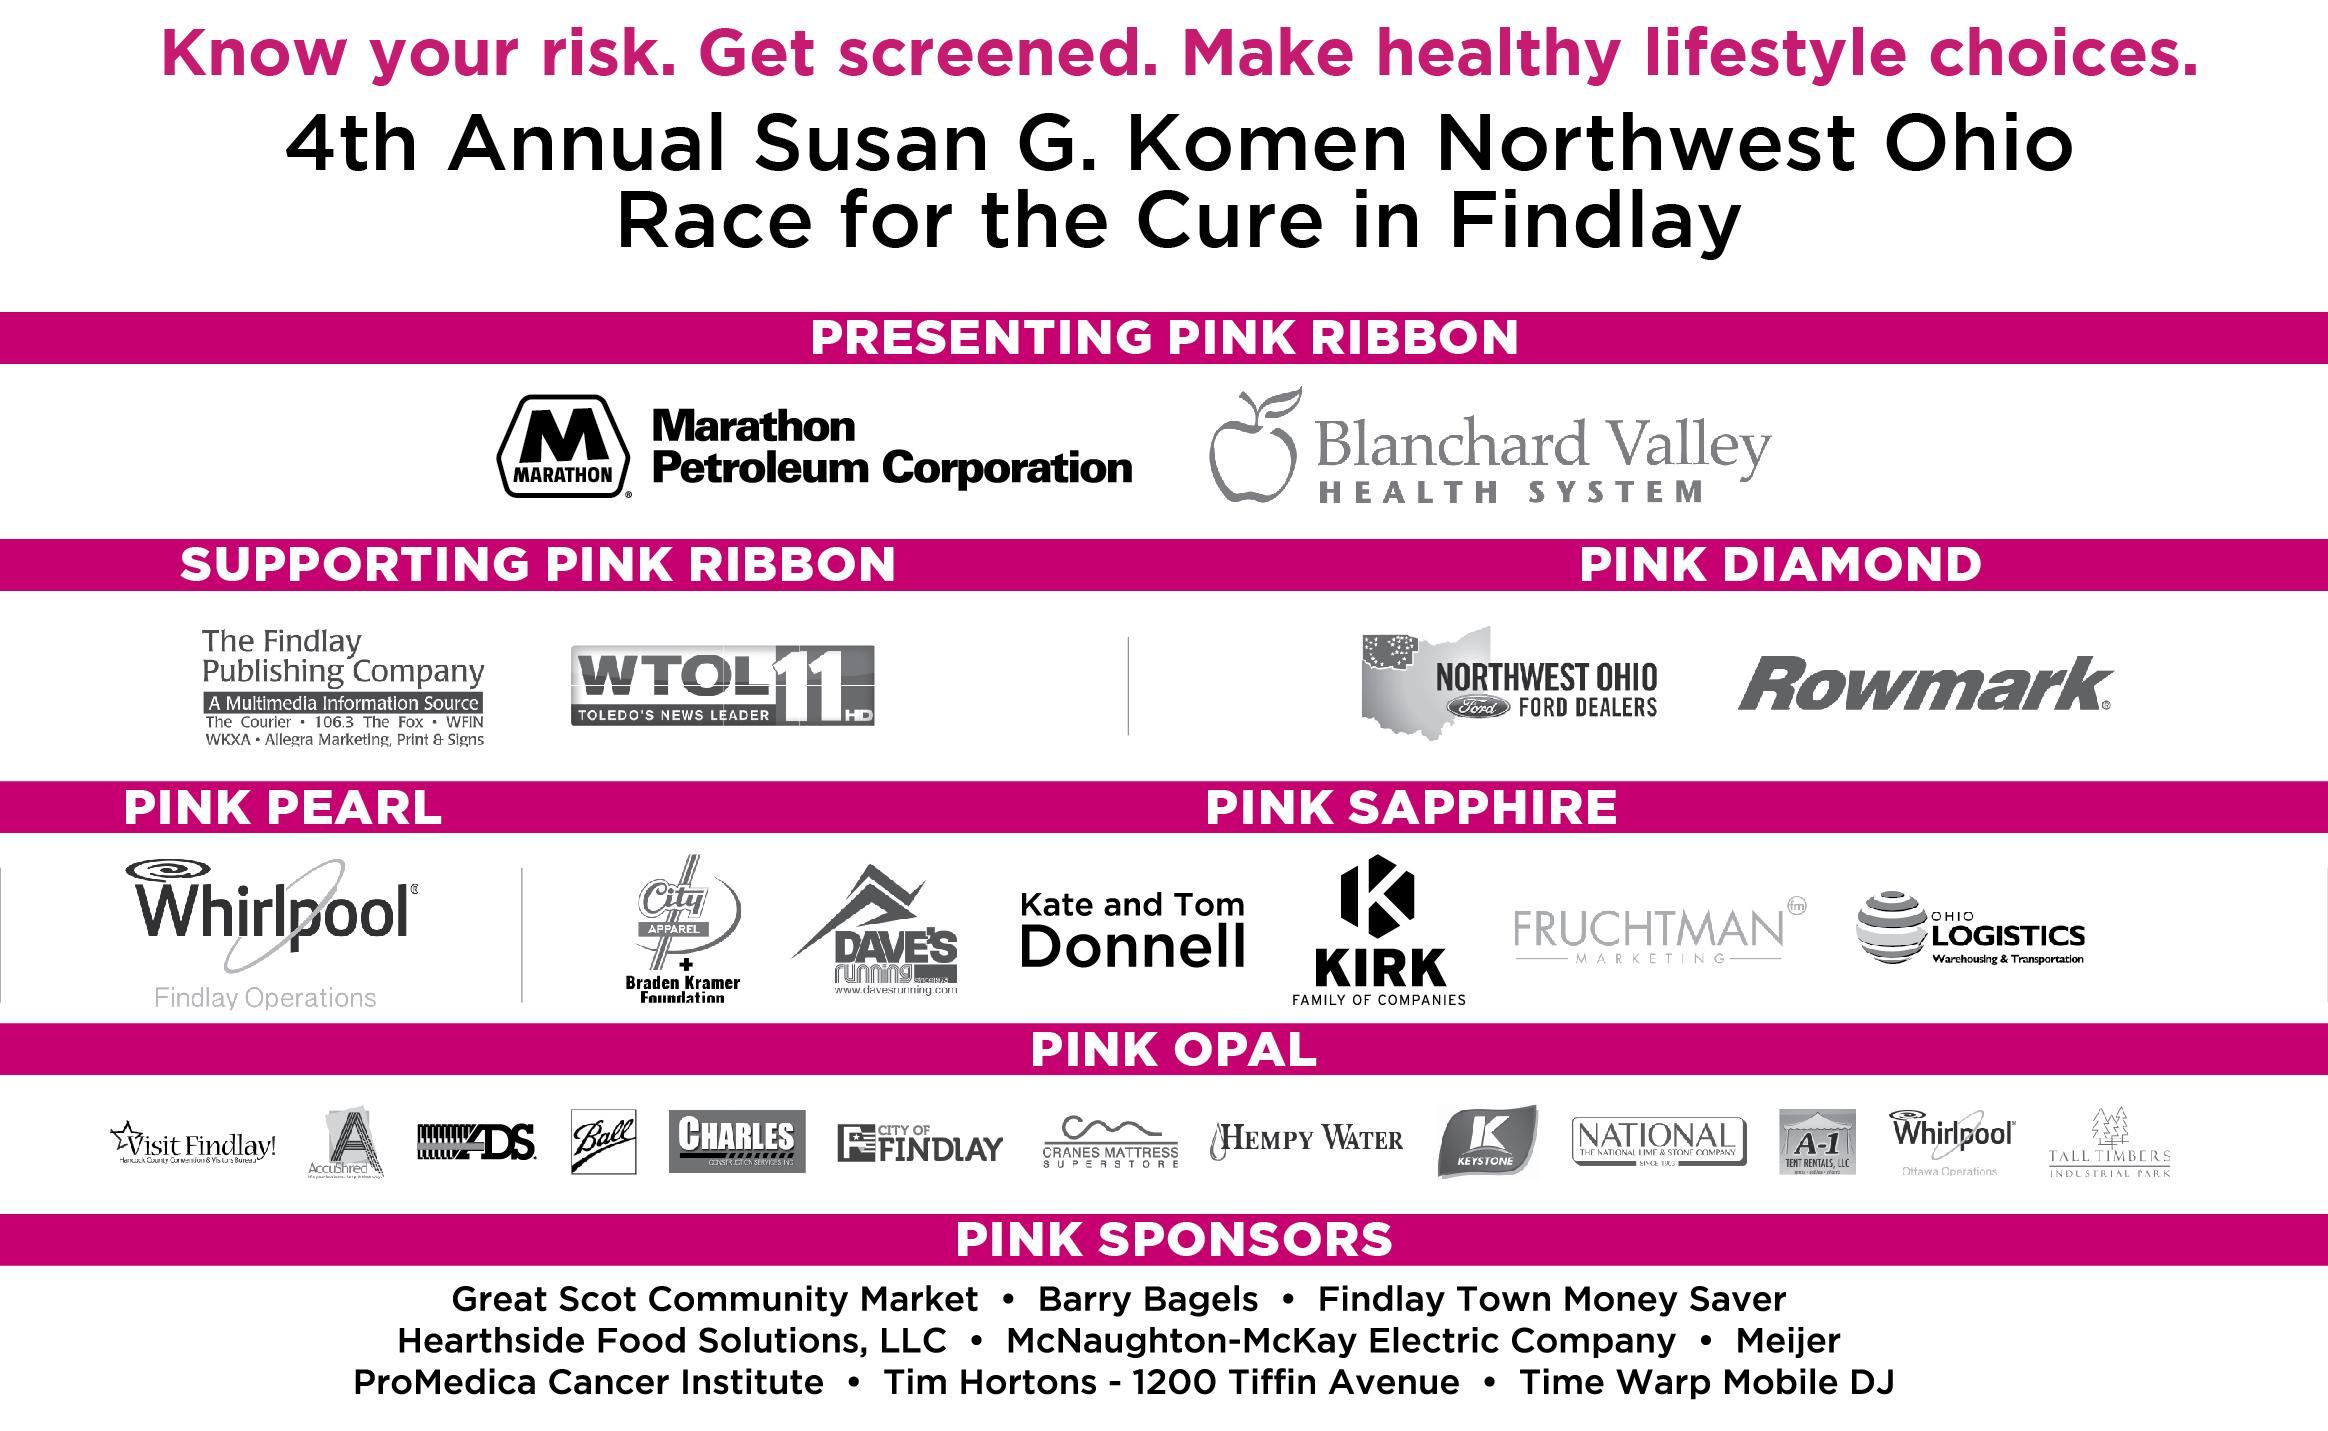 susan g komen northwest ohio race for the cure susan g click to enlarge 16 4730 compactsponsorlockup findlay 01